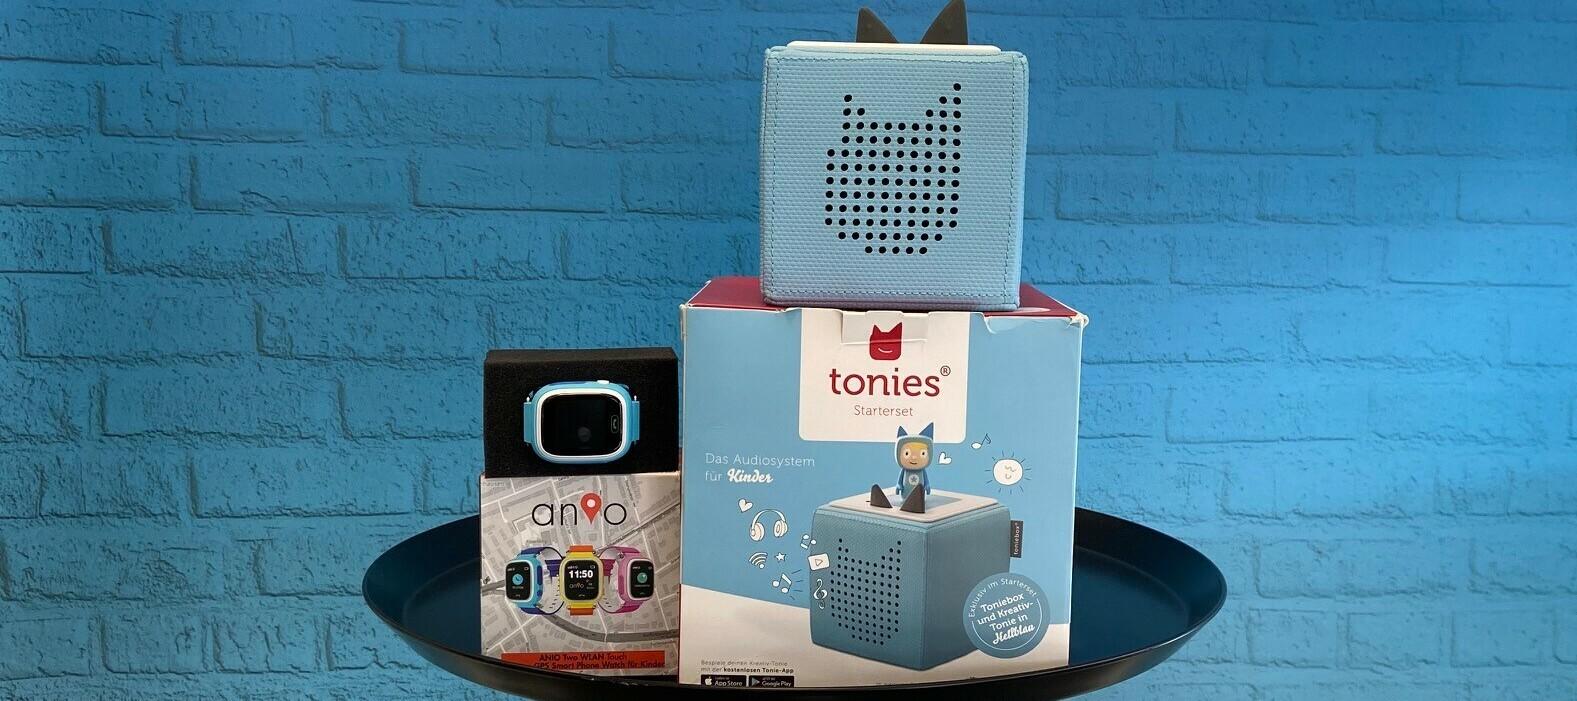 Anio Two WLAN Touch Smart Phone Watch & Toniebox als Testbundle